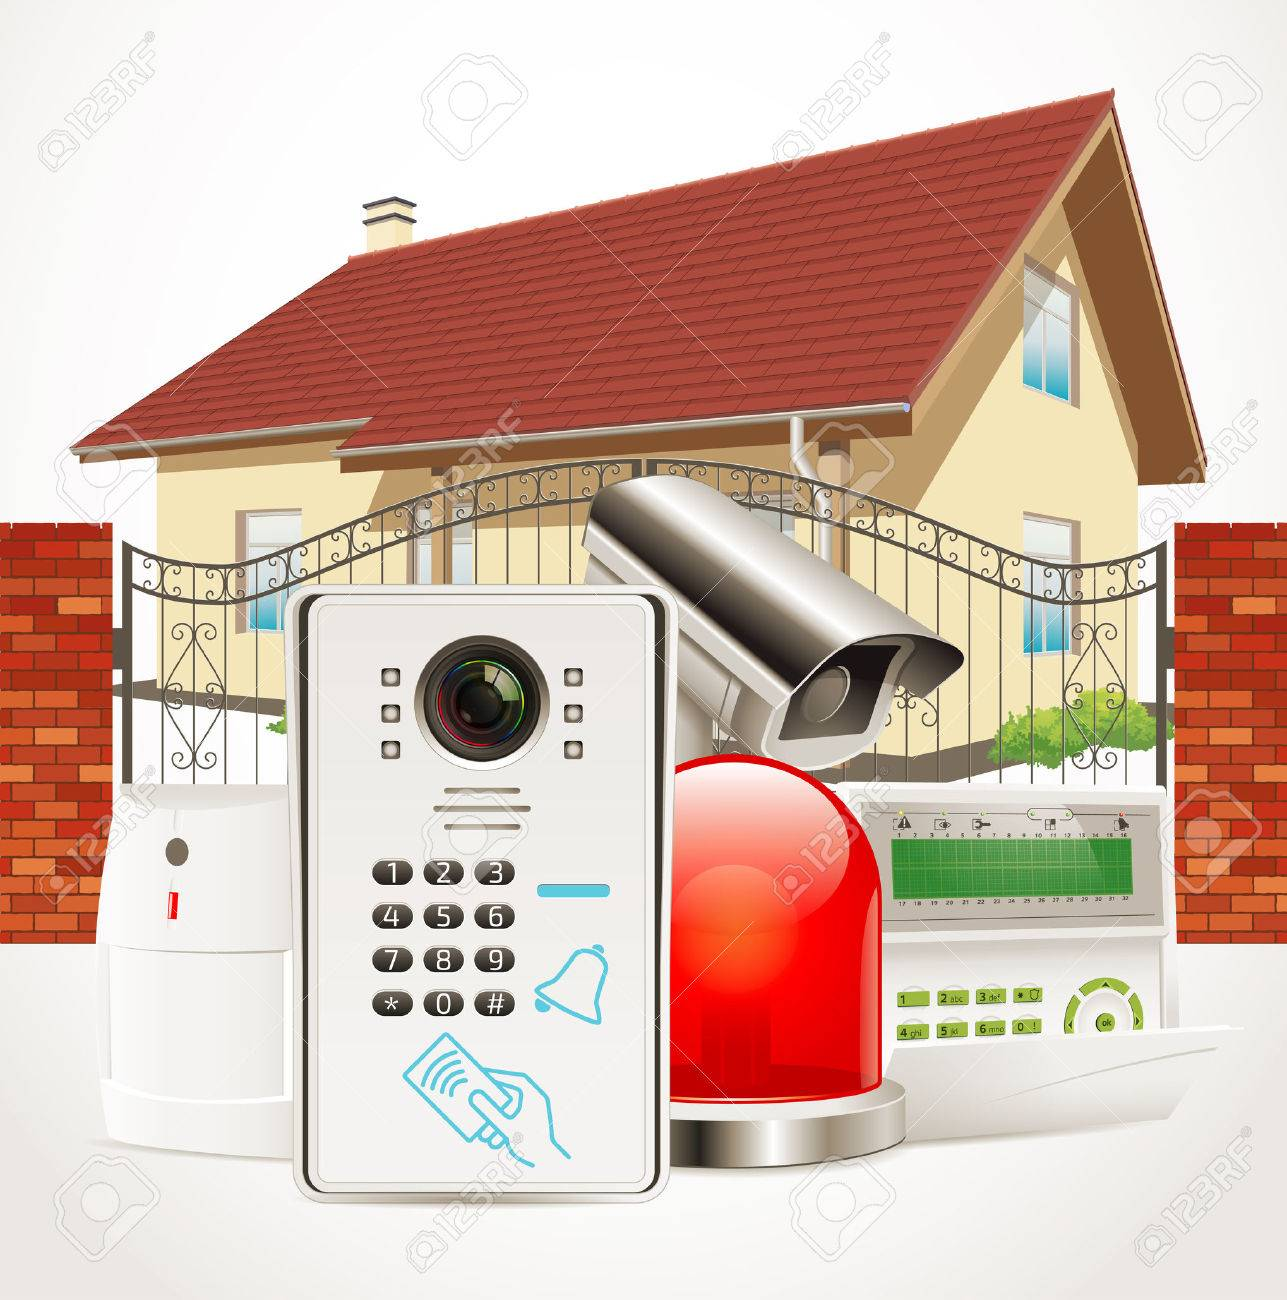 Home access control system - Video door phone, alarm system, motion sensor, cctv camera - 55519488